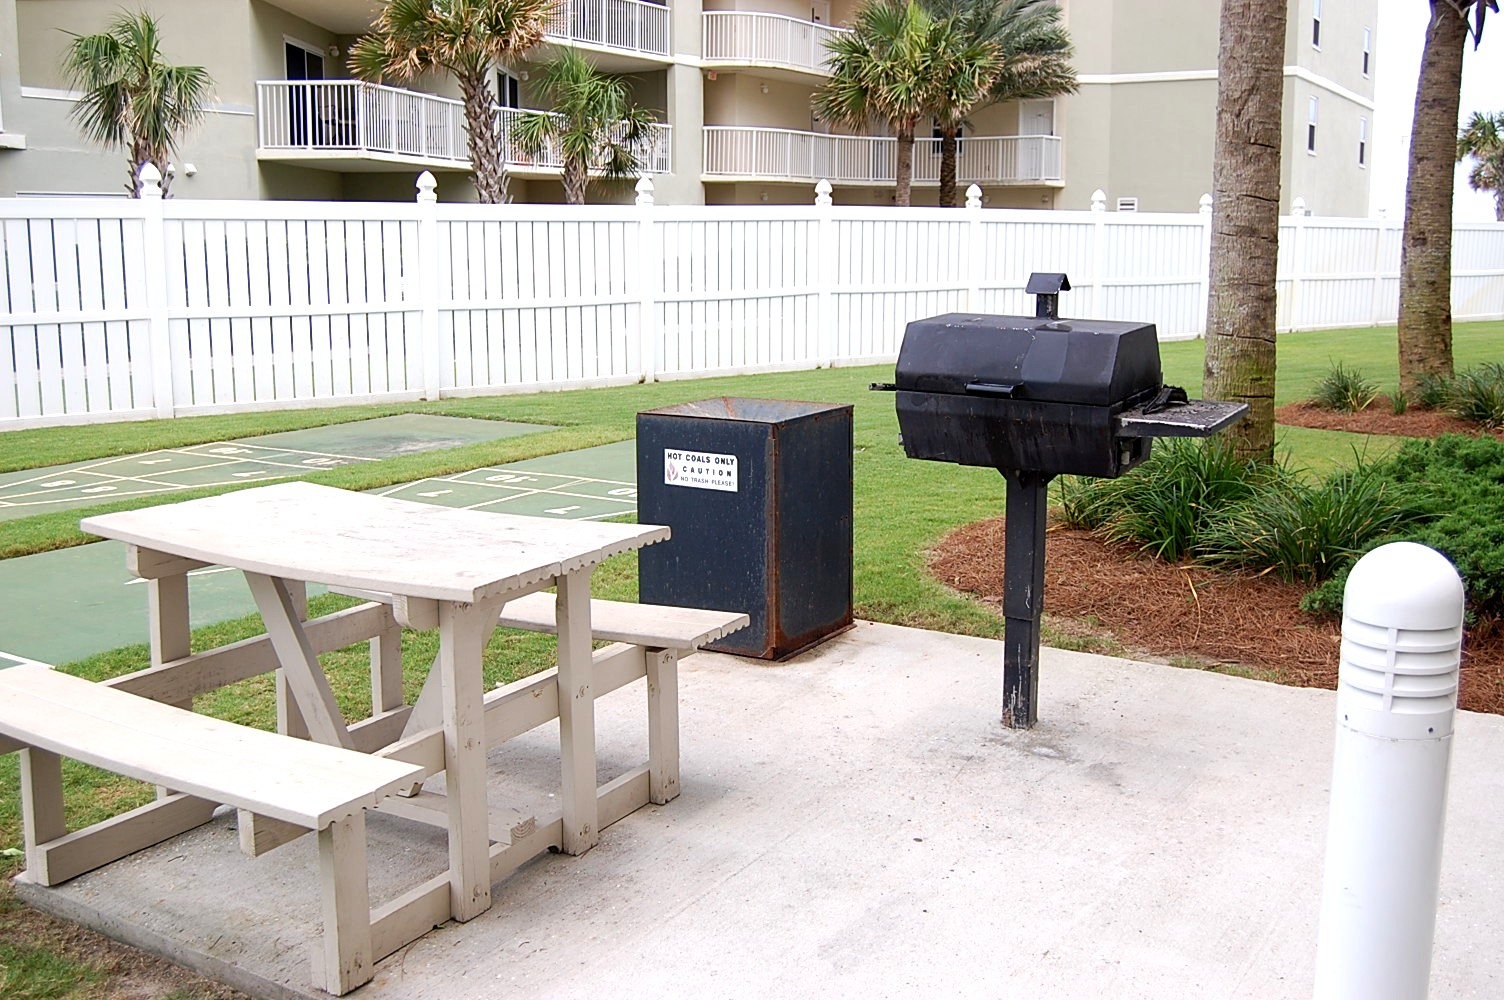 Seaside Beach & Racquet 5415 Condo rental in Seaside Beach and Racquet Club in Orange Beach Alabama - #23